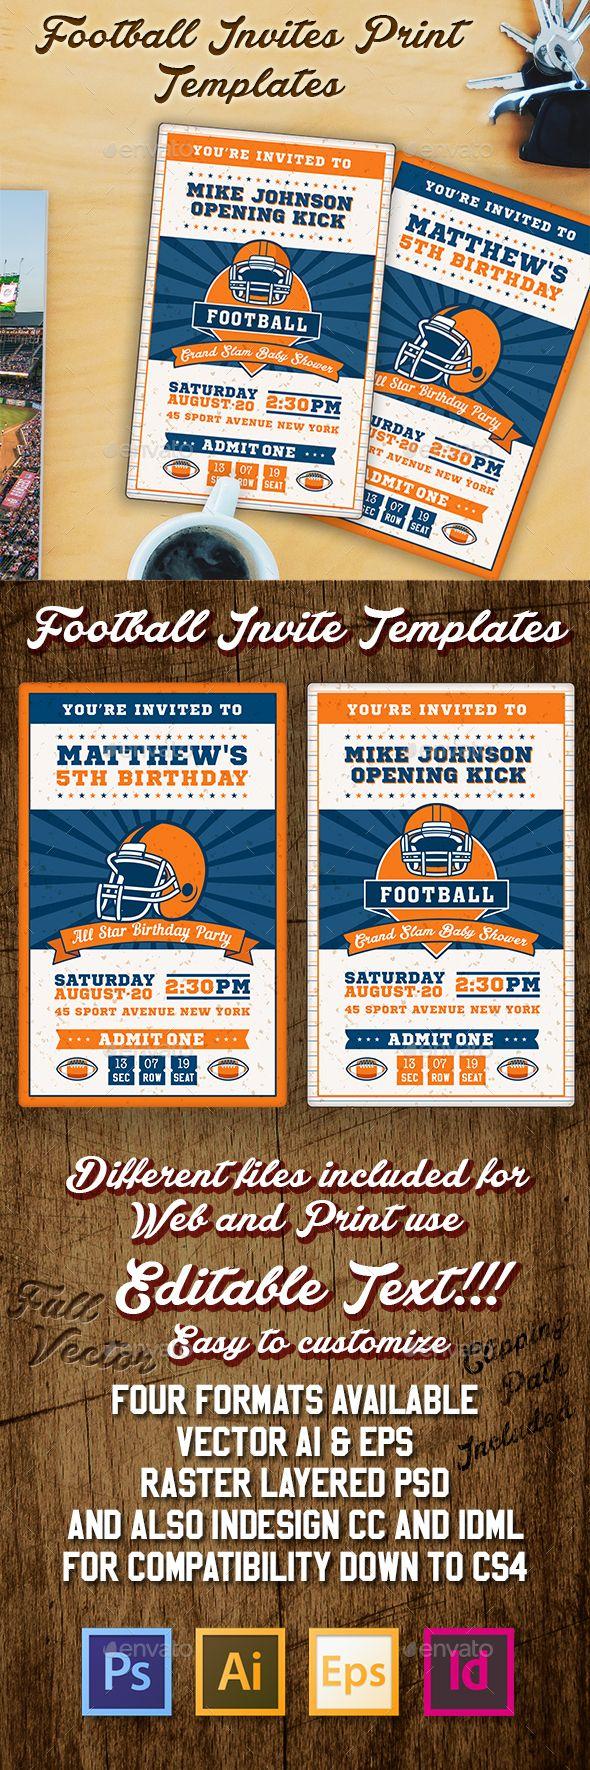 Football Ticket Party Invites   Football Ticket Psd Templates